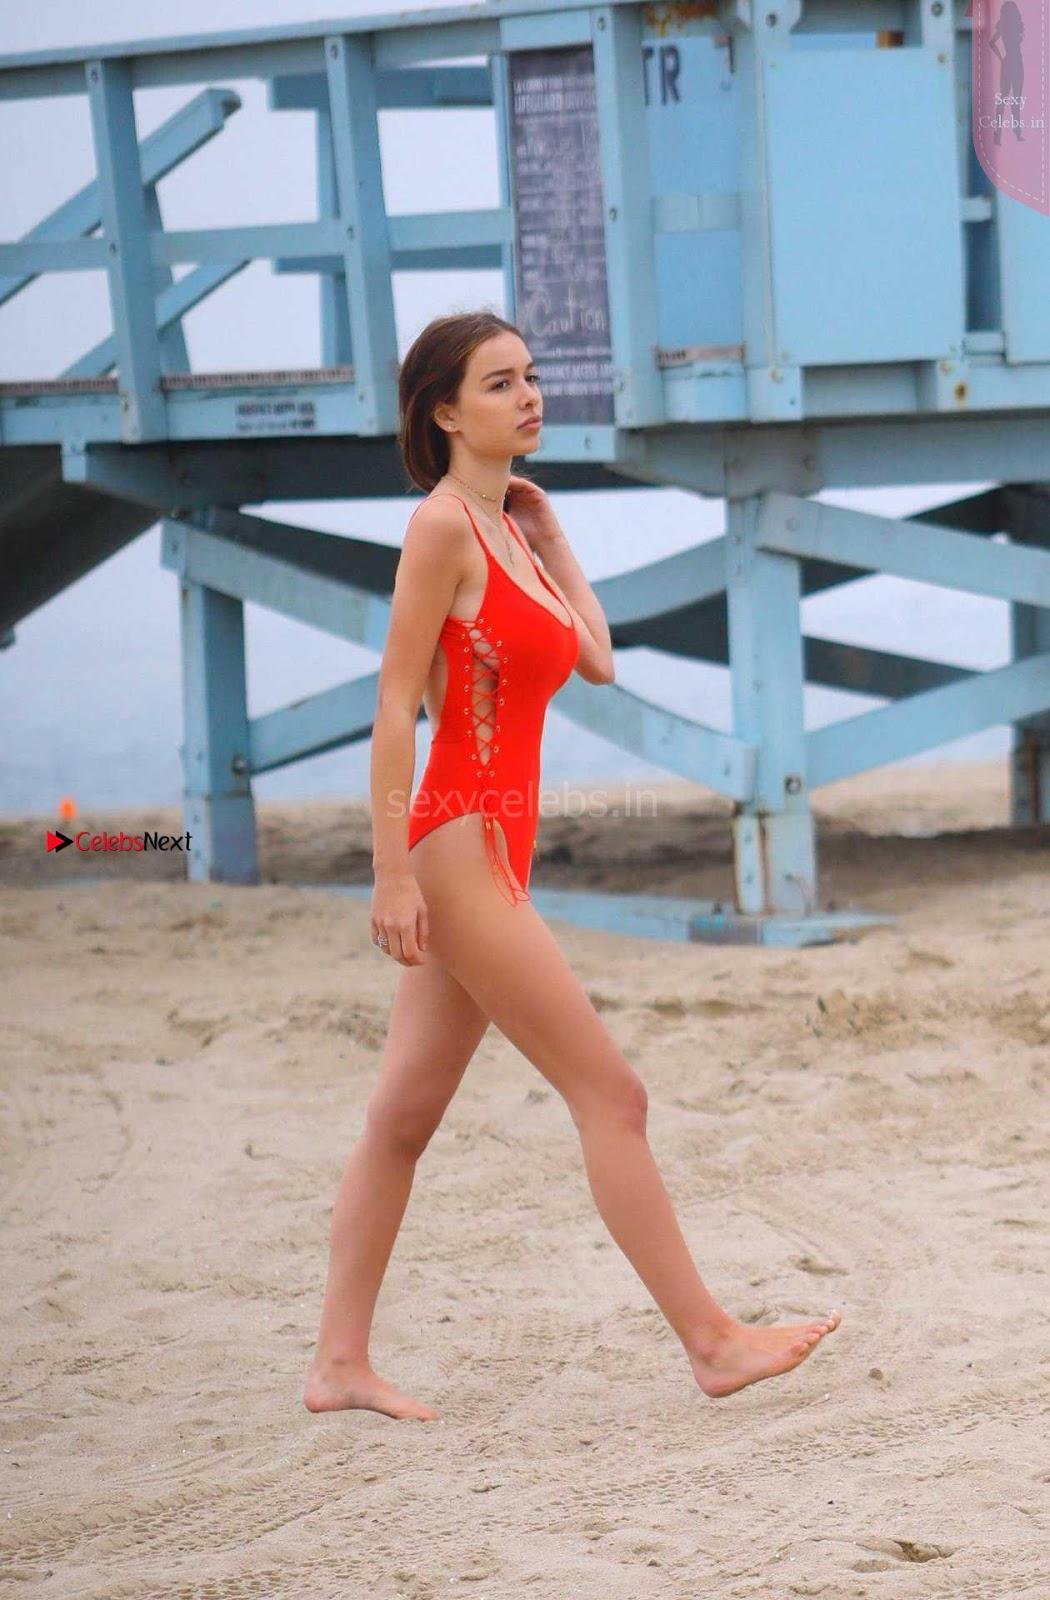 Beautiful Sexy Teenage Beauty Bikini Model Sophie Mudd  ~ SexyCelebs.in Exclusive